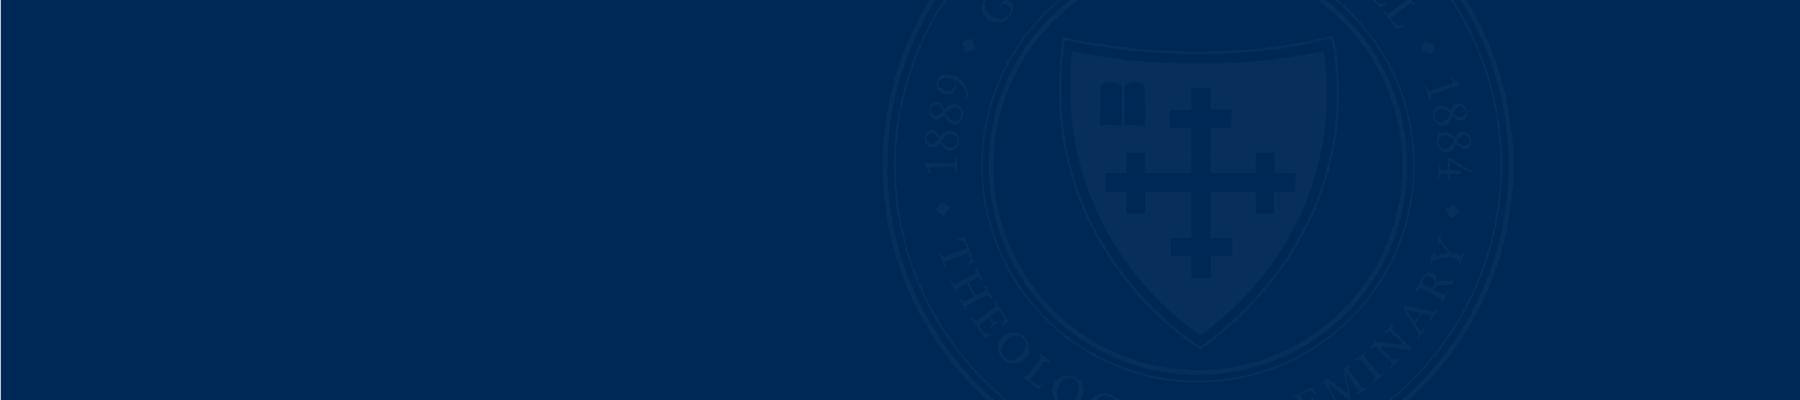 GCTS-Seal-Header-Blue